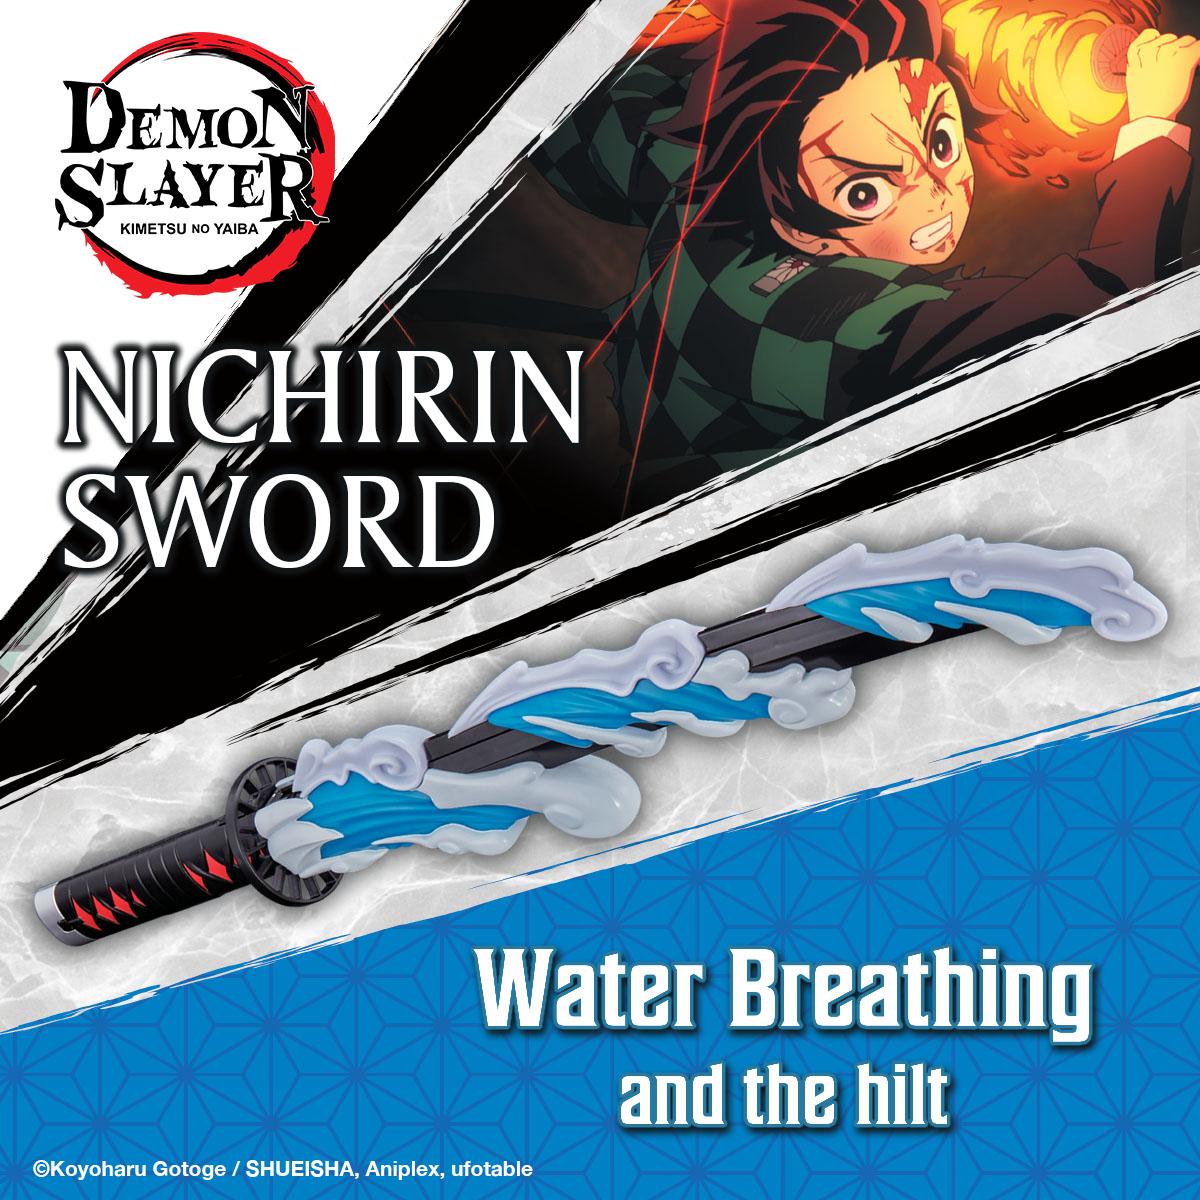 Demon Slayer DX Nichirin Sword New Release From Japan Kimetsu no Yaiba